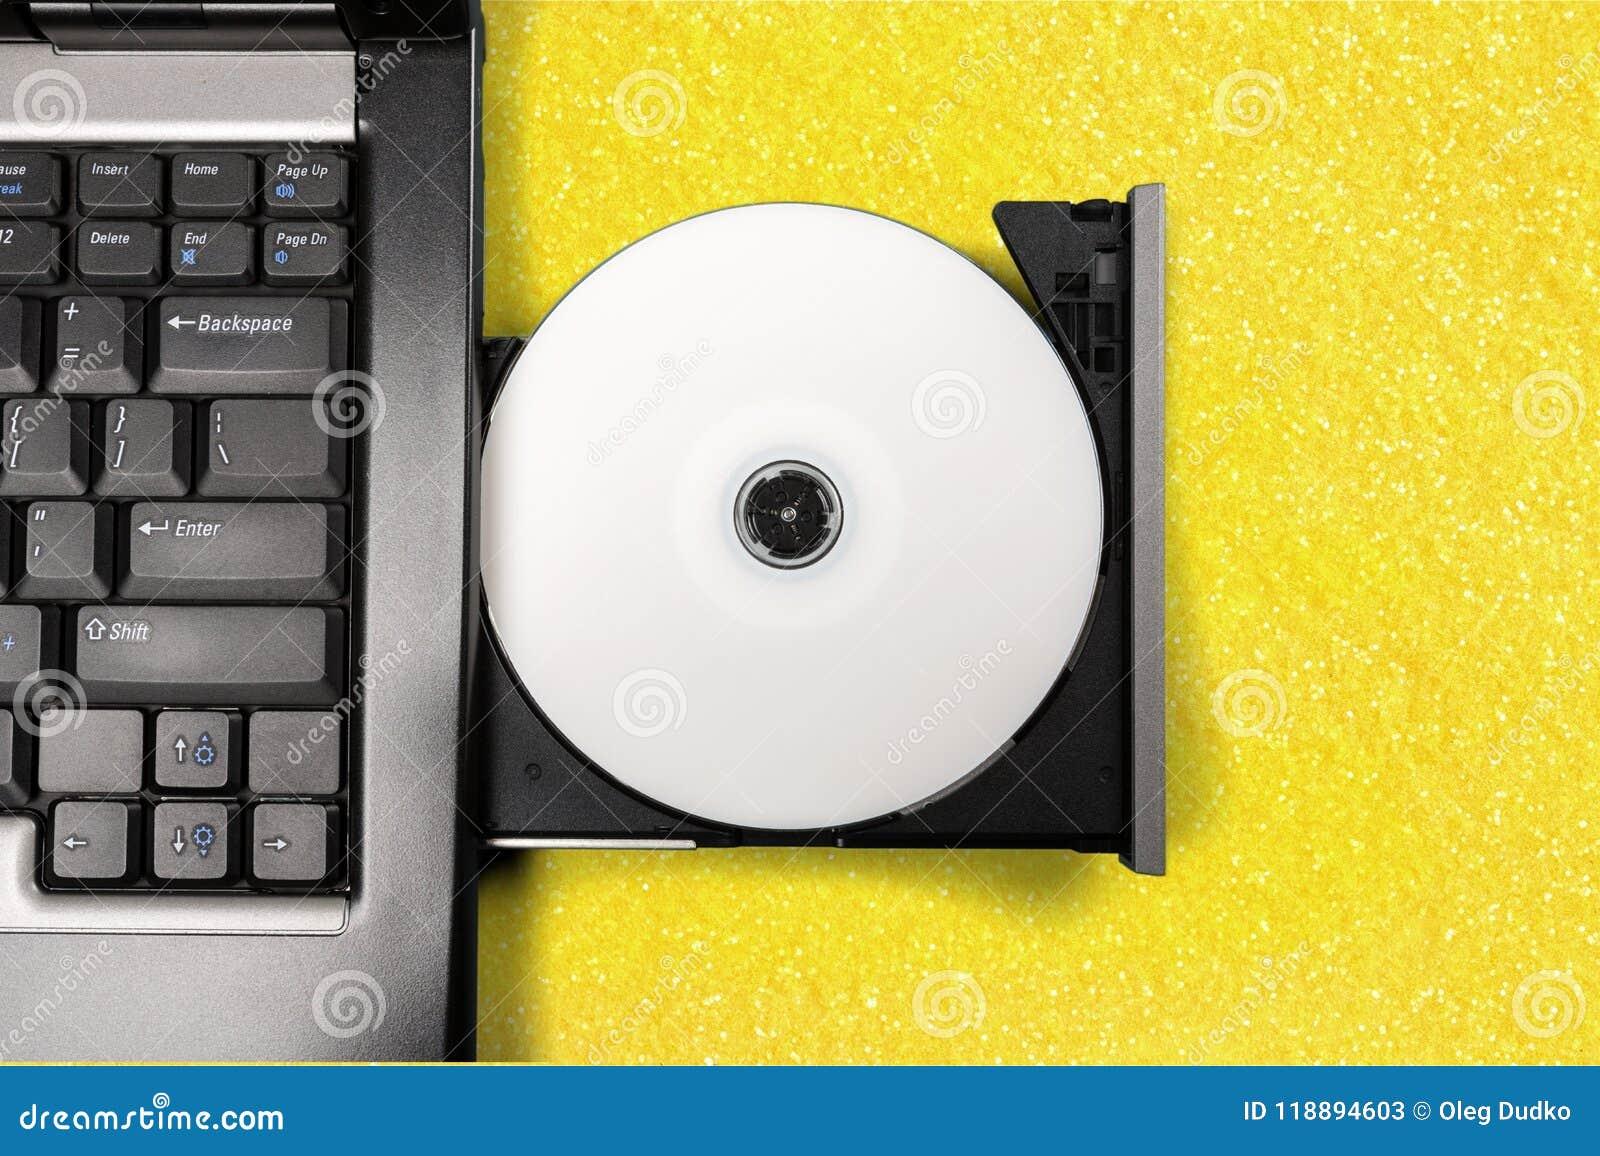 Downloading movies dvd computer bizaardvark: don\'t think, just.